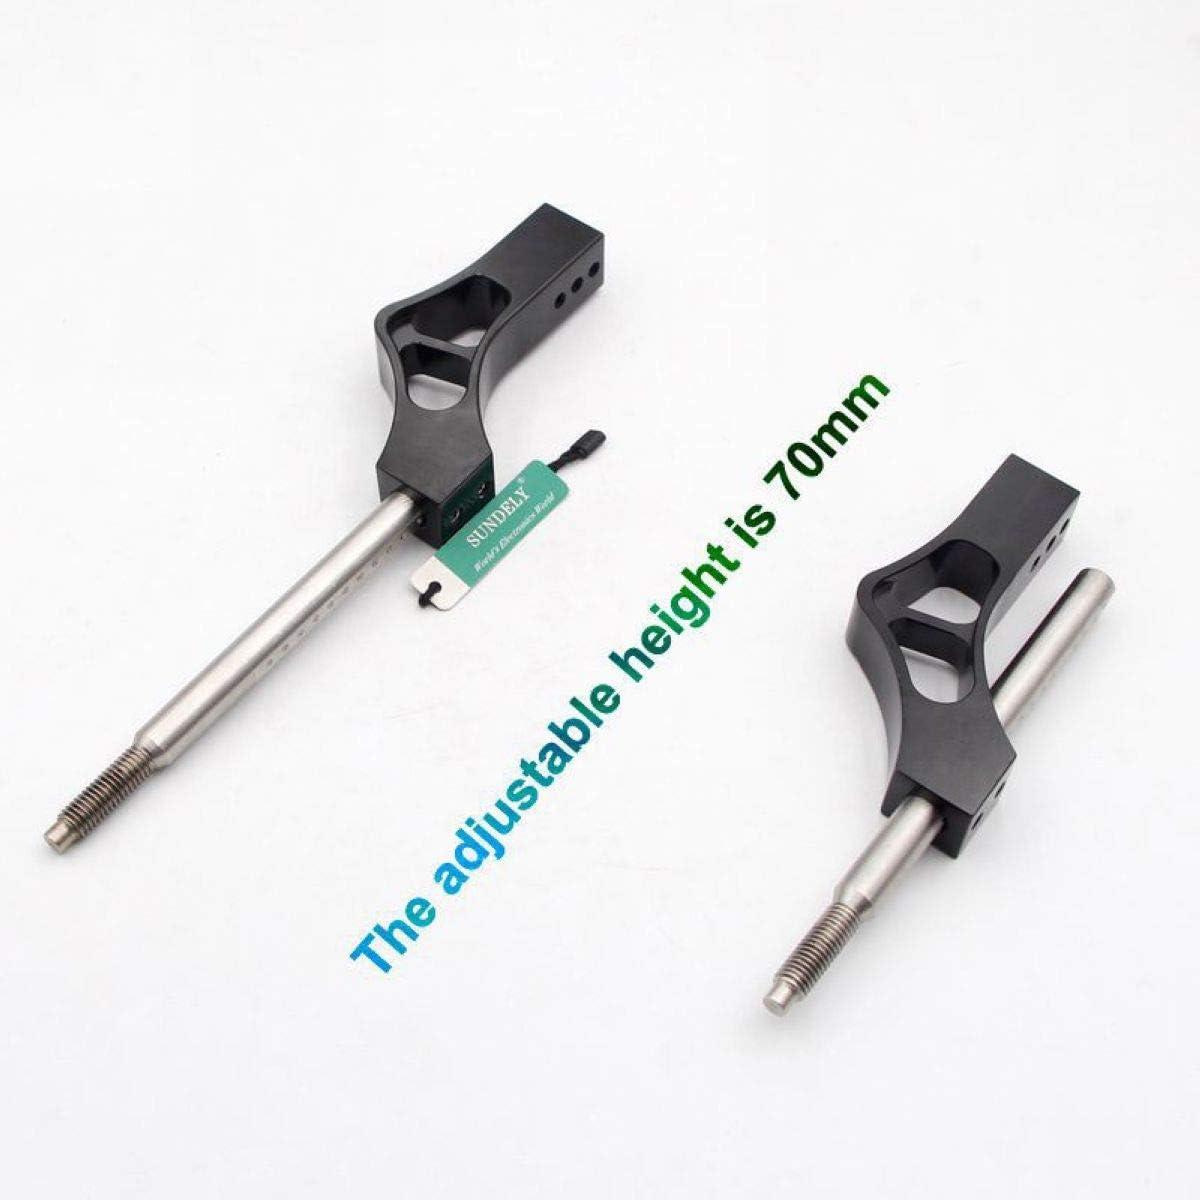 SUNDELY/® Black Shift Knob Shifter Extension Extender Lever Gear for Stick Manual